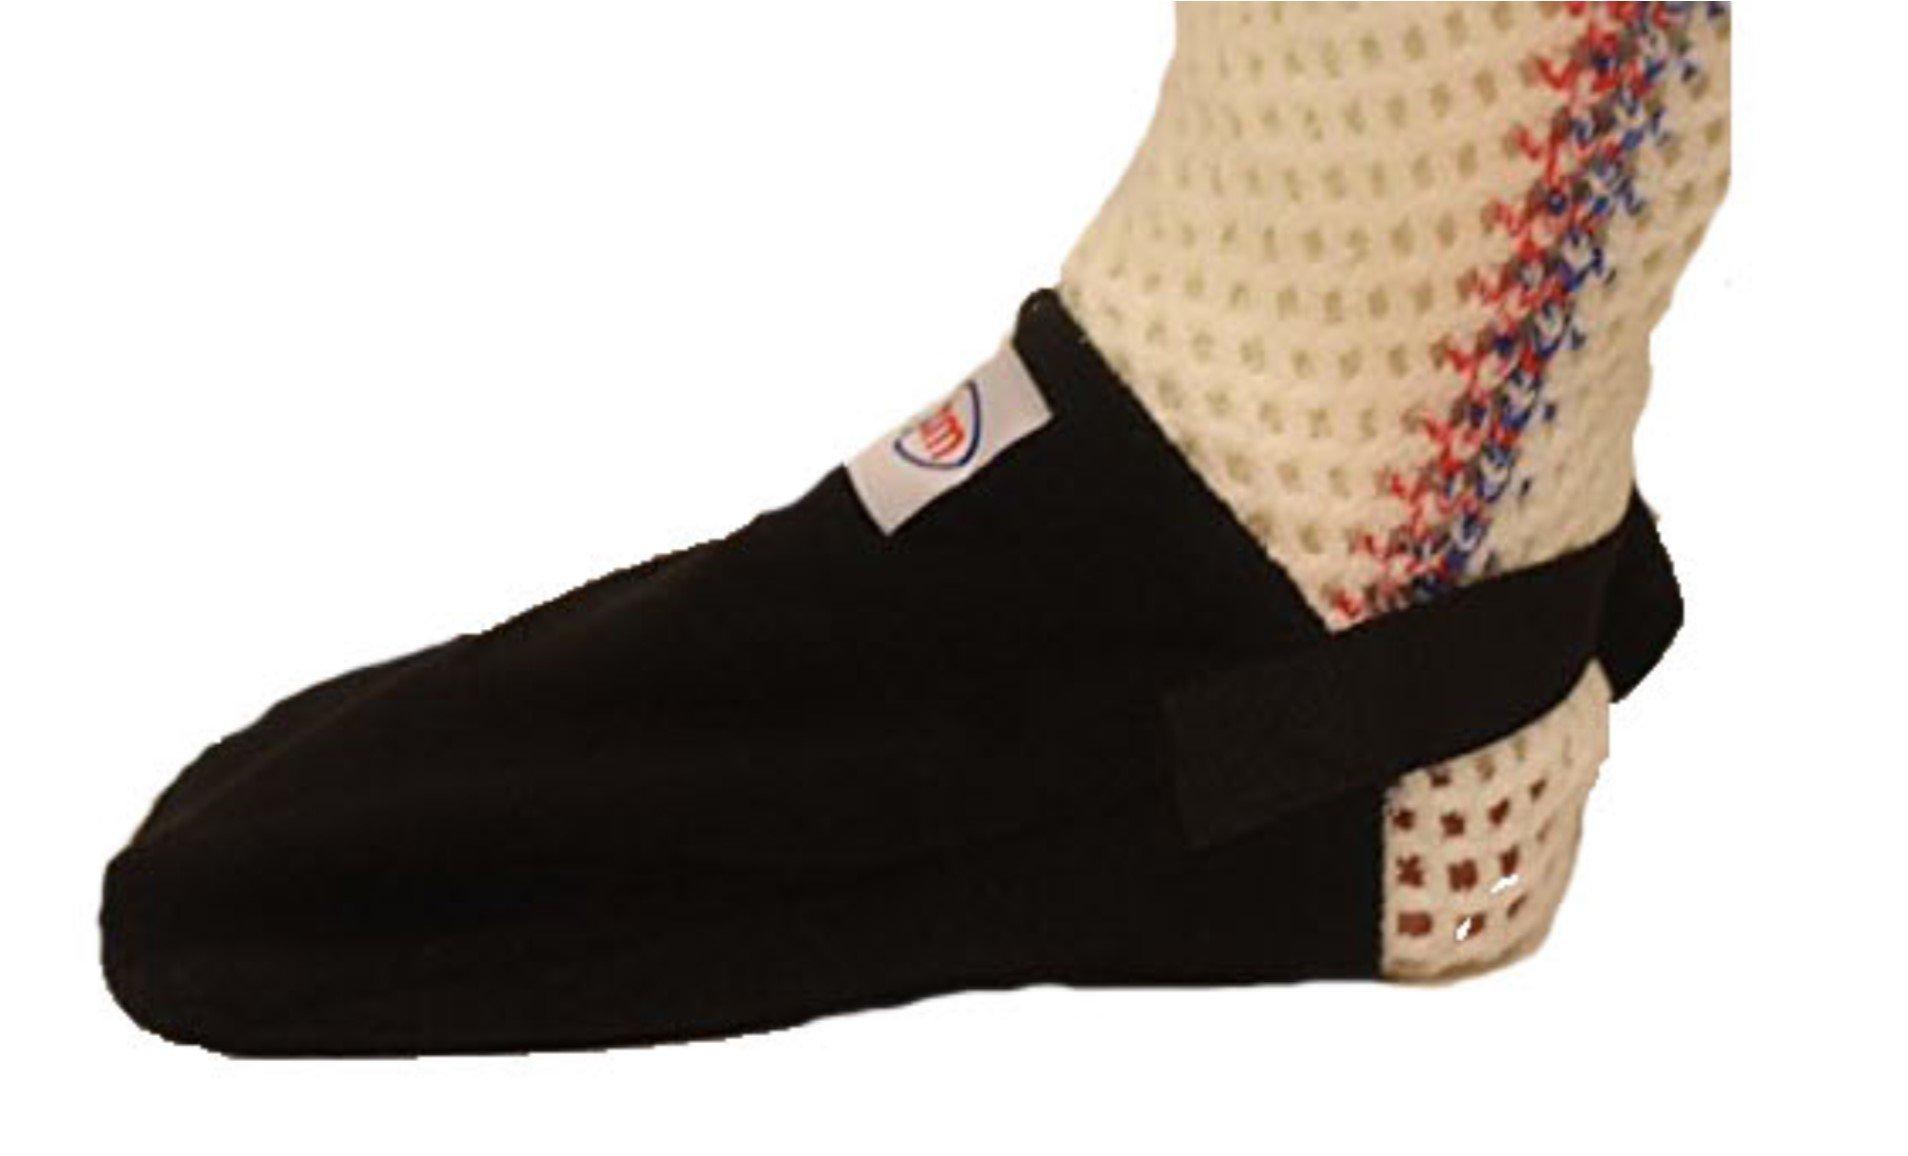 GBM Adjustable Non-Slip Cast Toe Cover (Black)